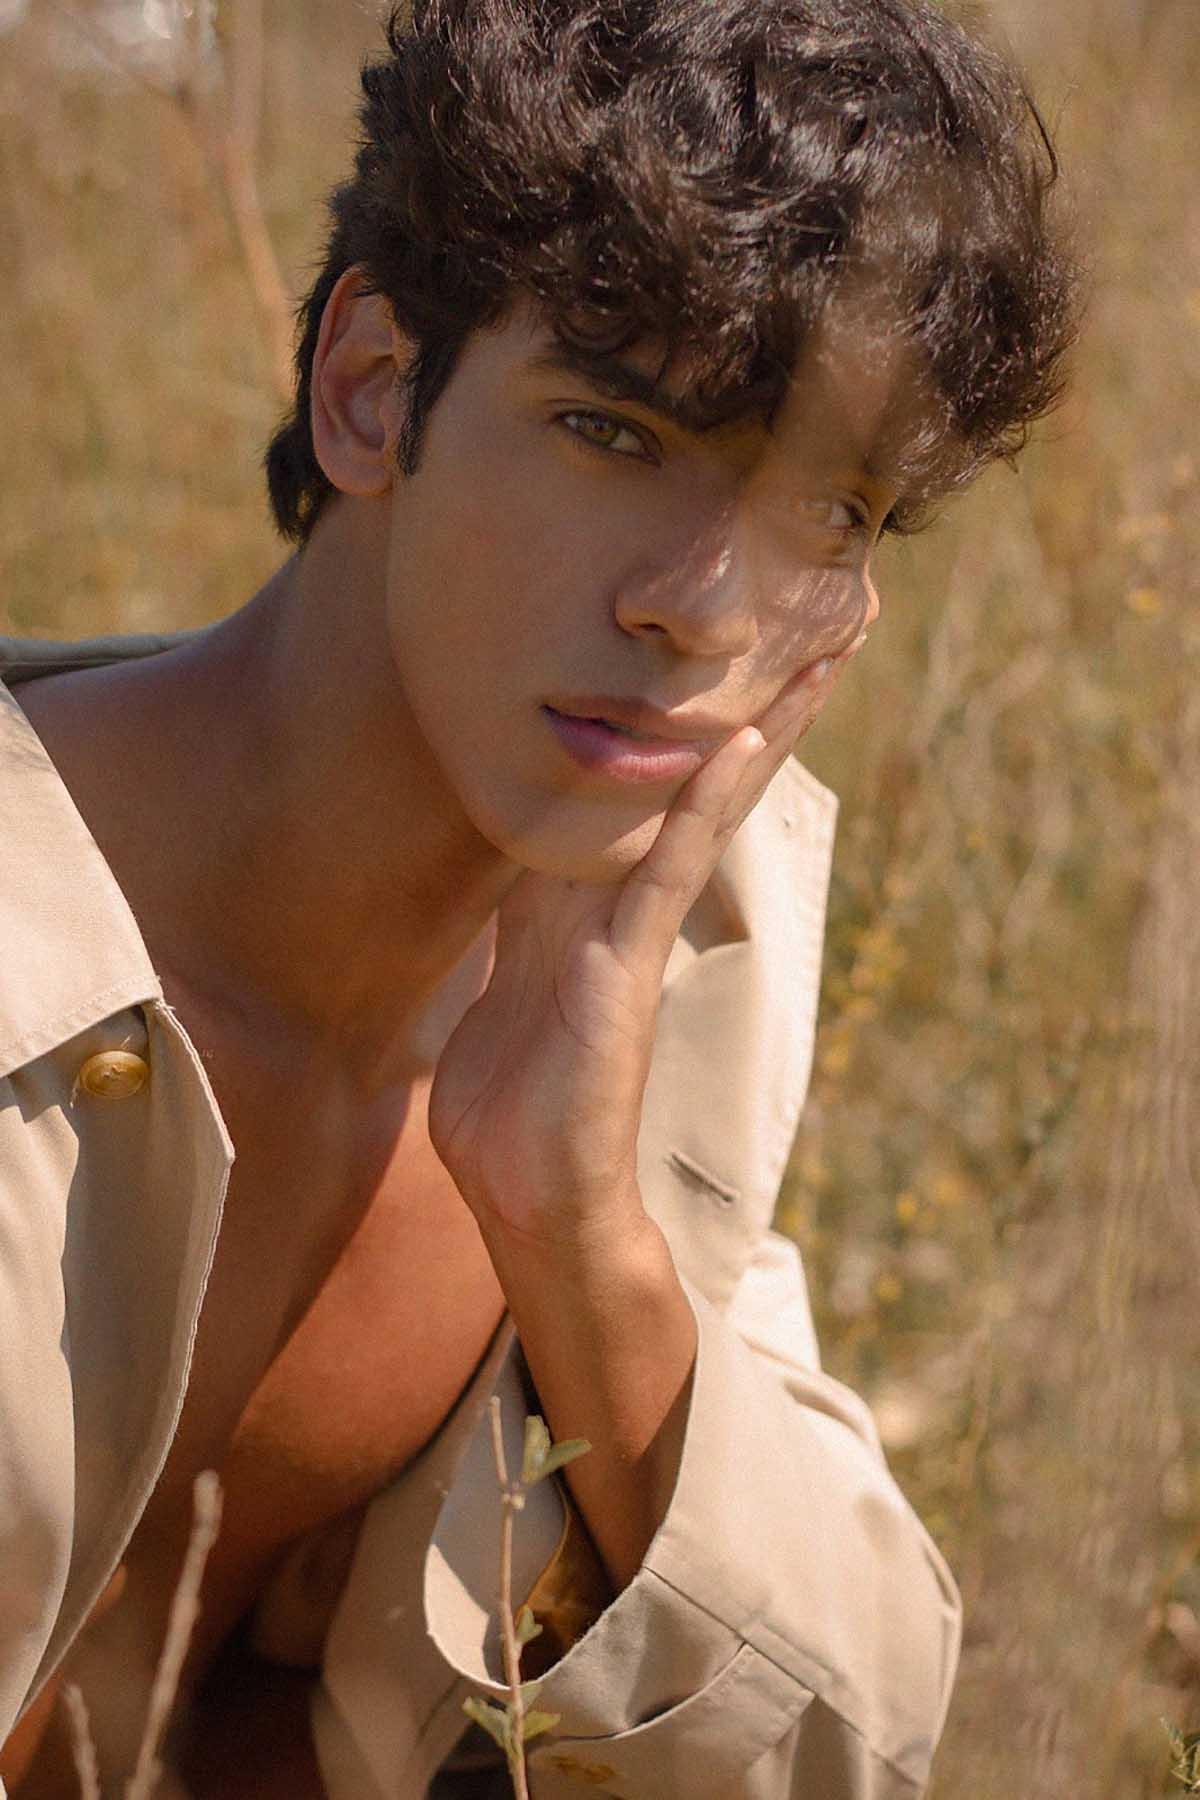 Tiago Alves by David Aldea for Brazilian Male Model